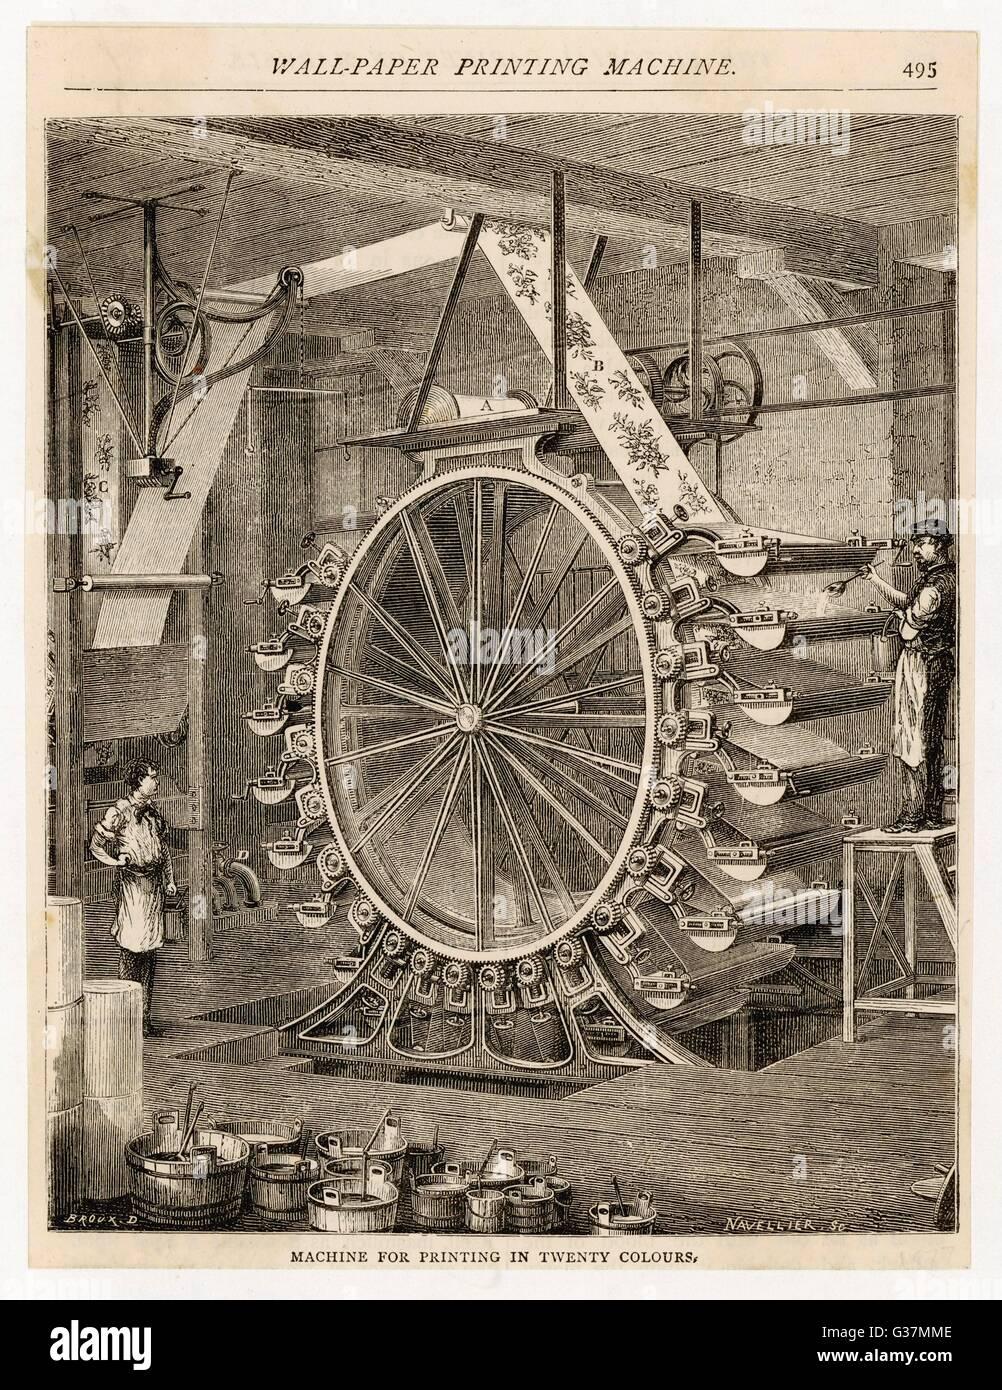 Wallpaper manufacture : colour press.         Date: 1877 - Stock Image